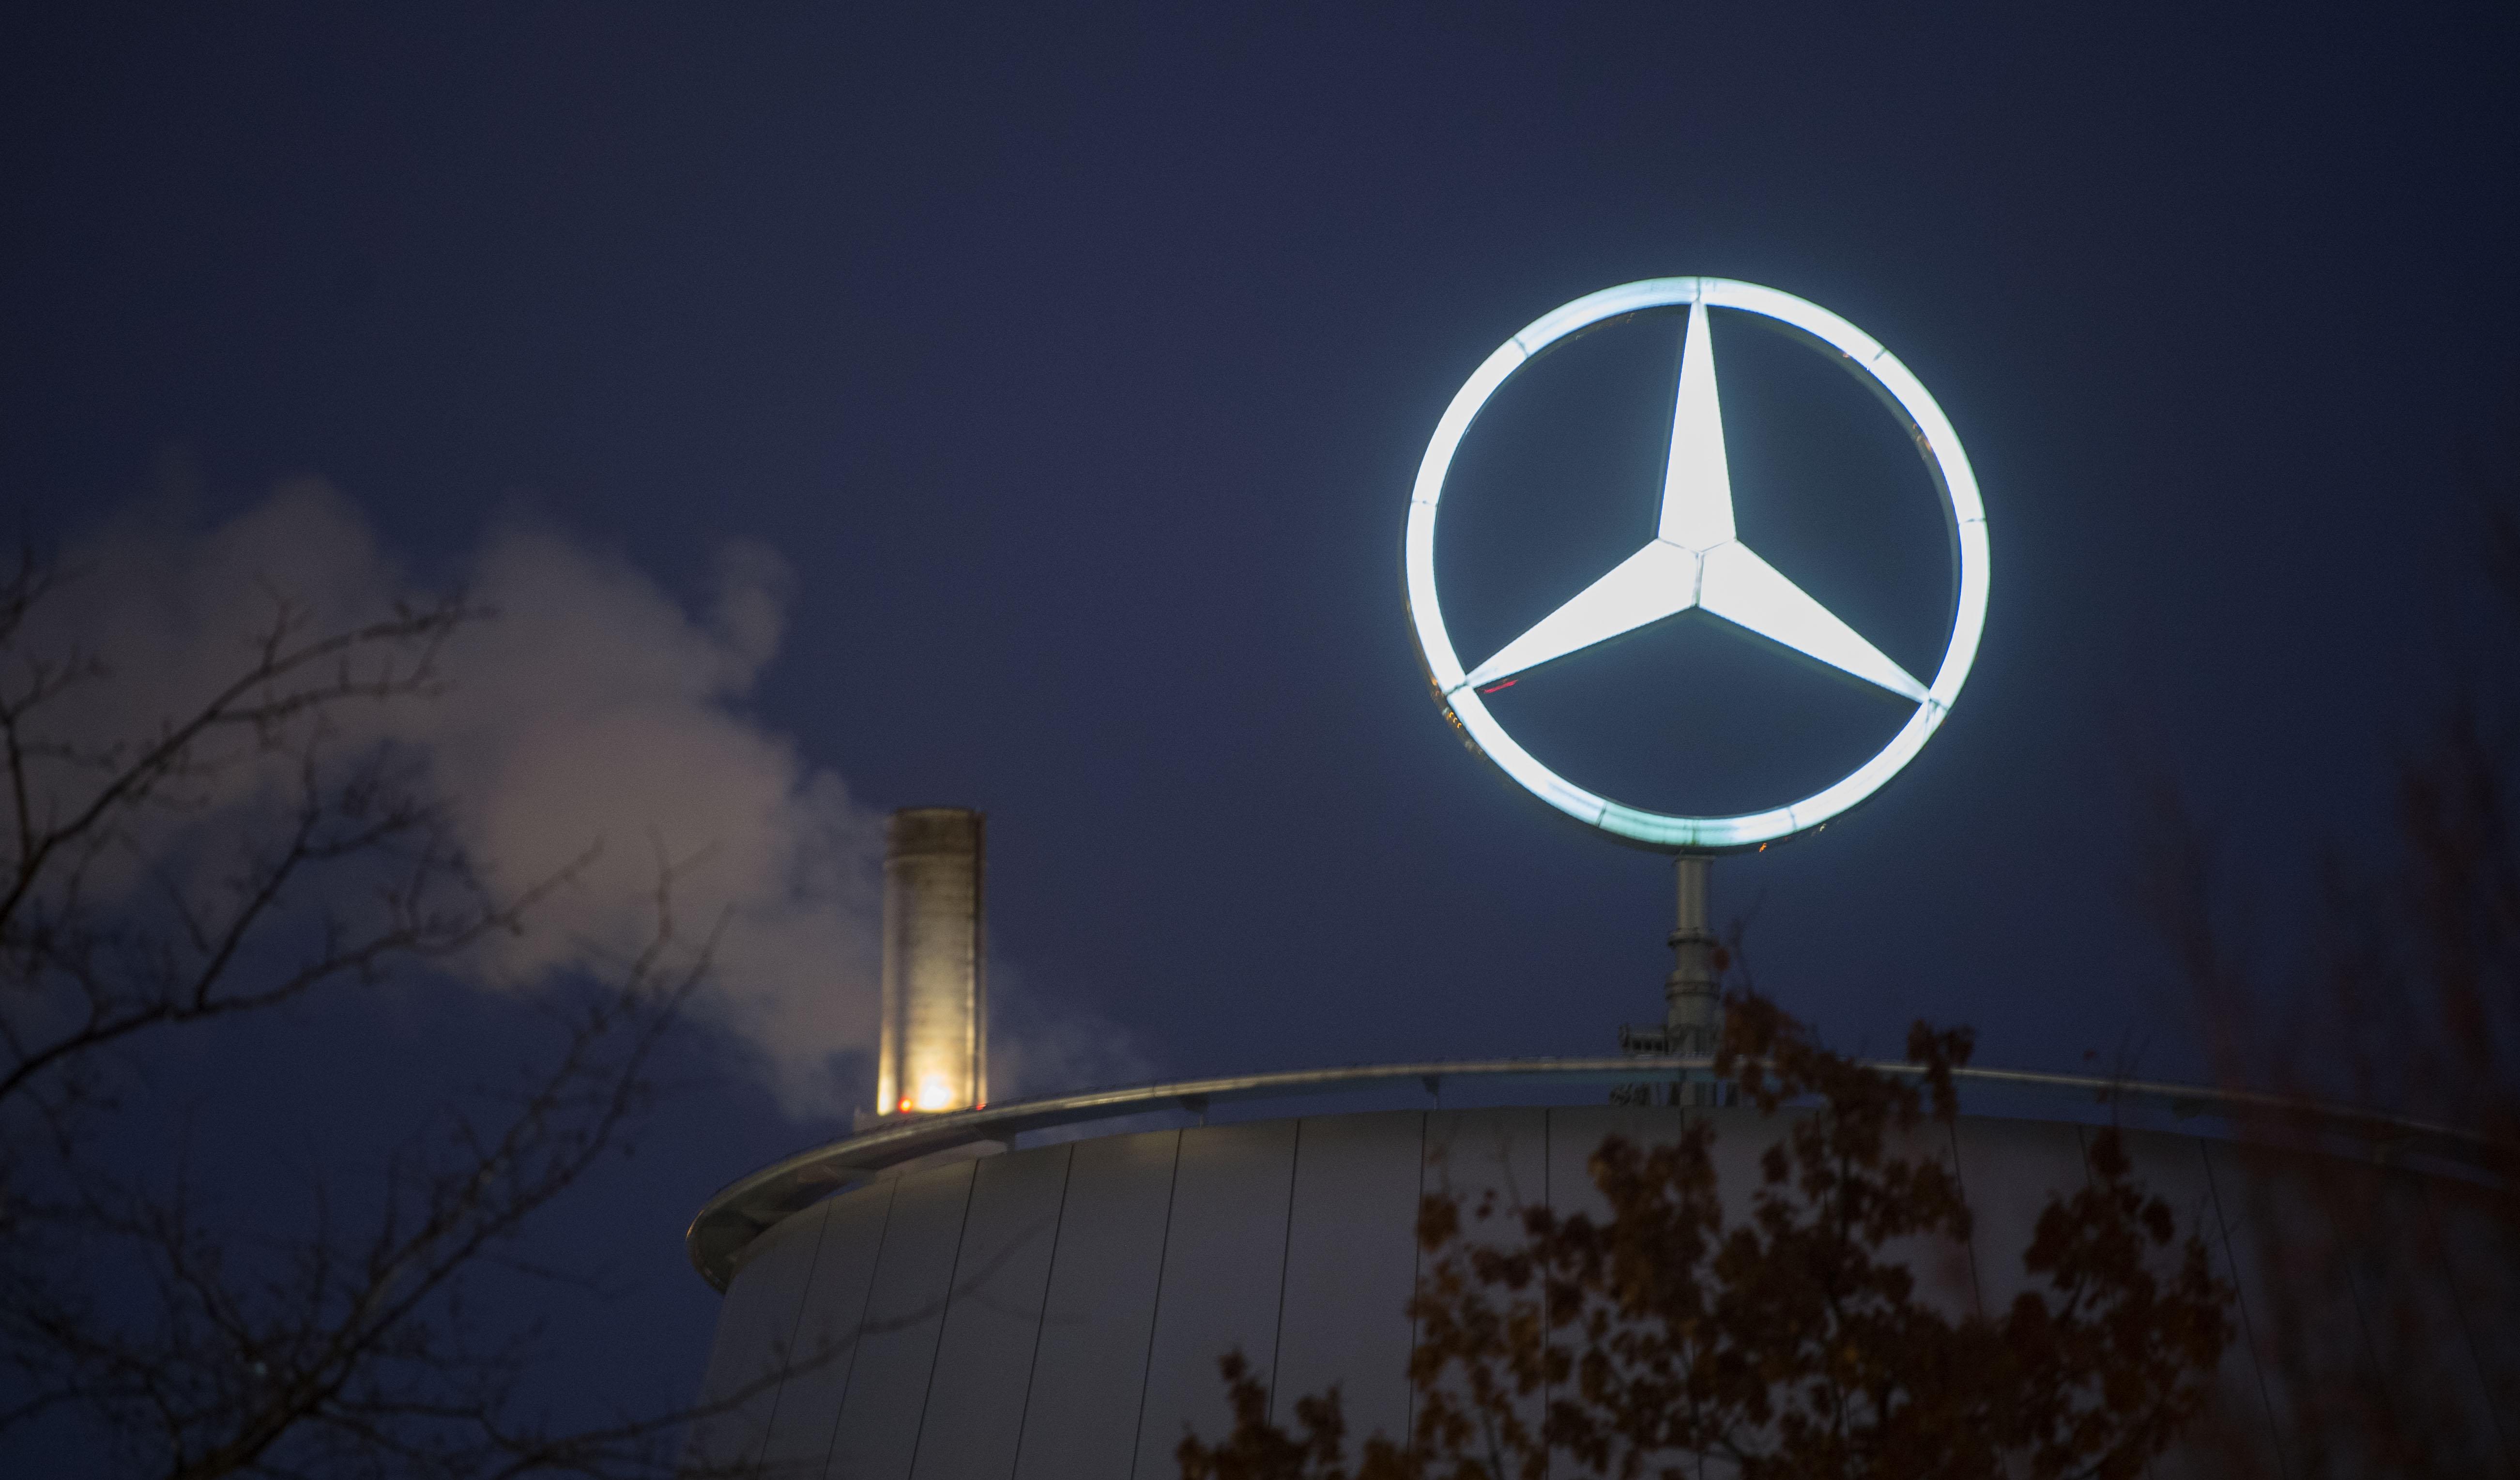 Daimler AG: Annual press conference